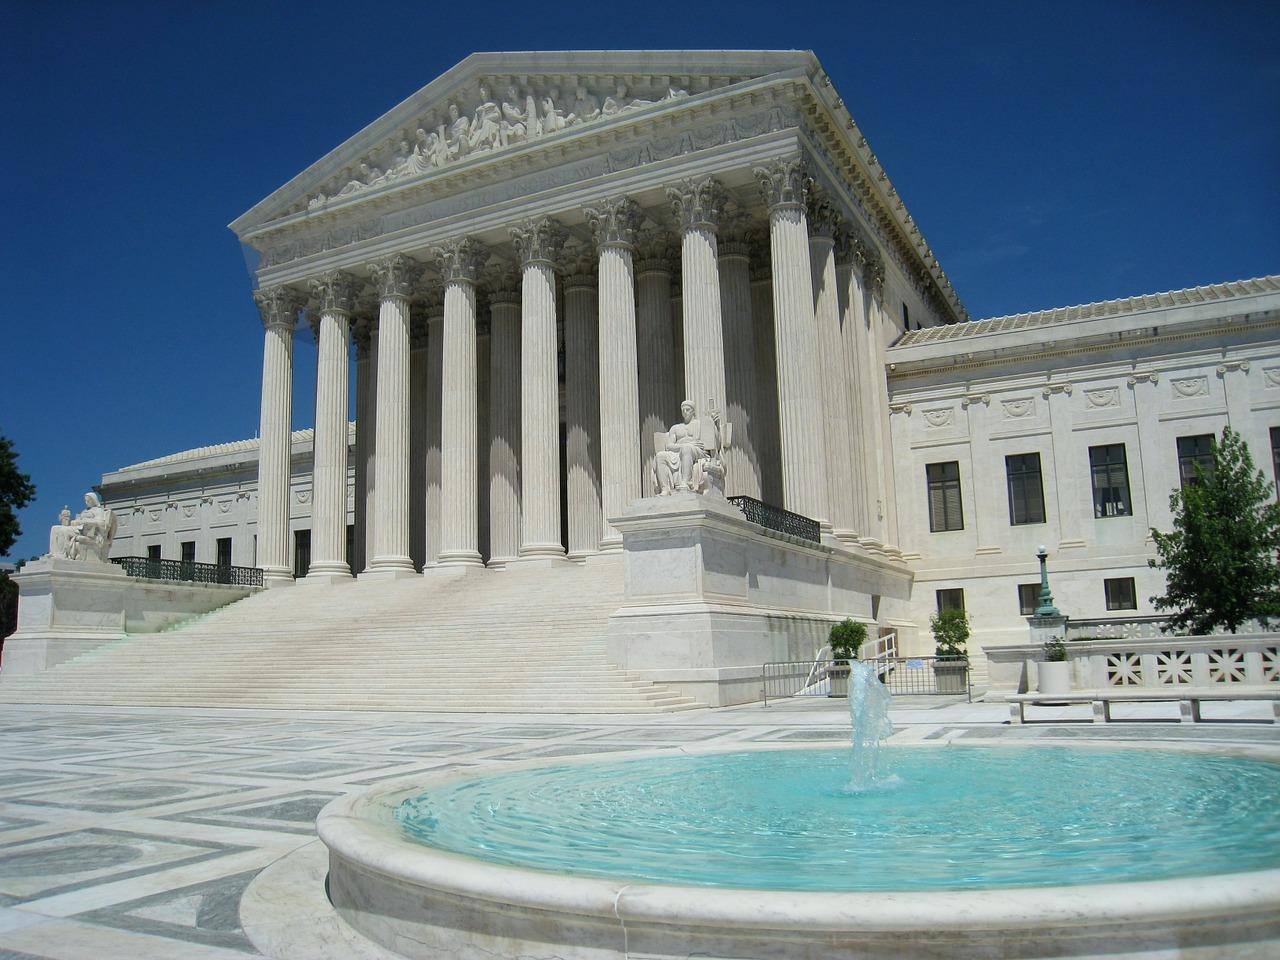 U.S. Supreme Court image: Pixabay